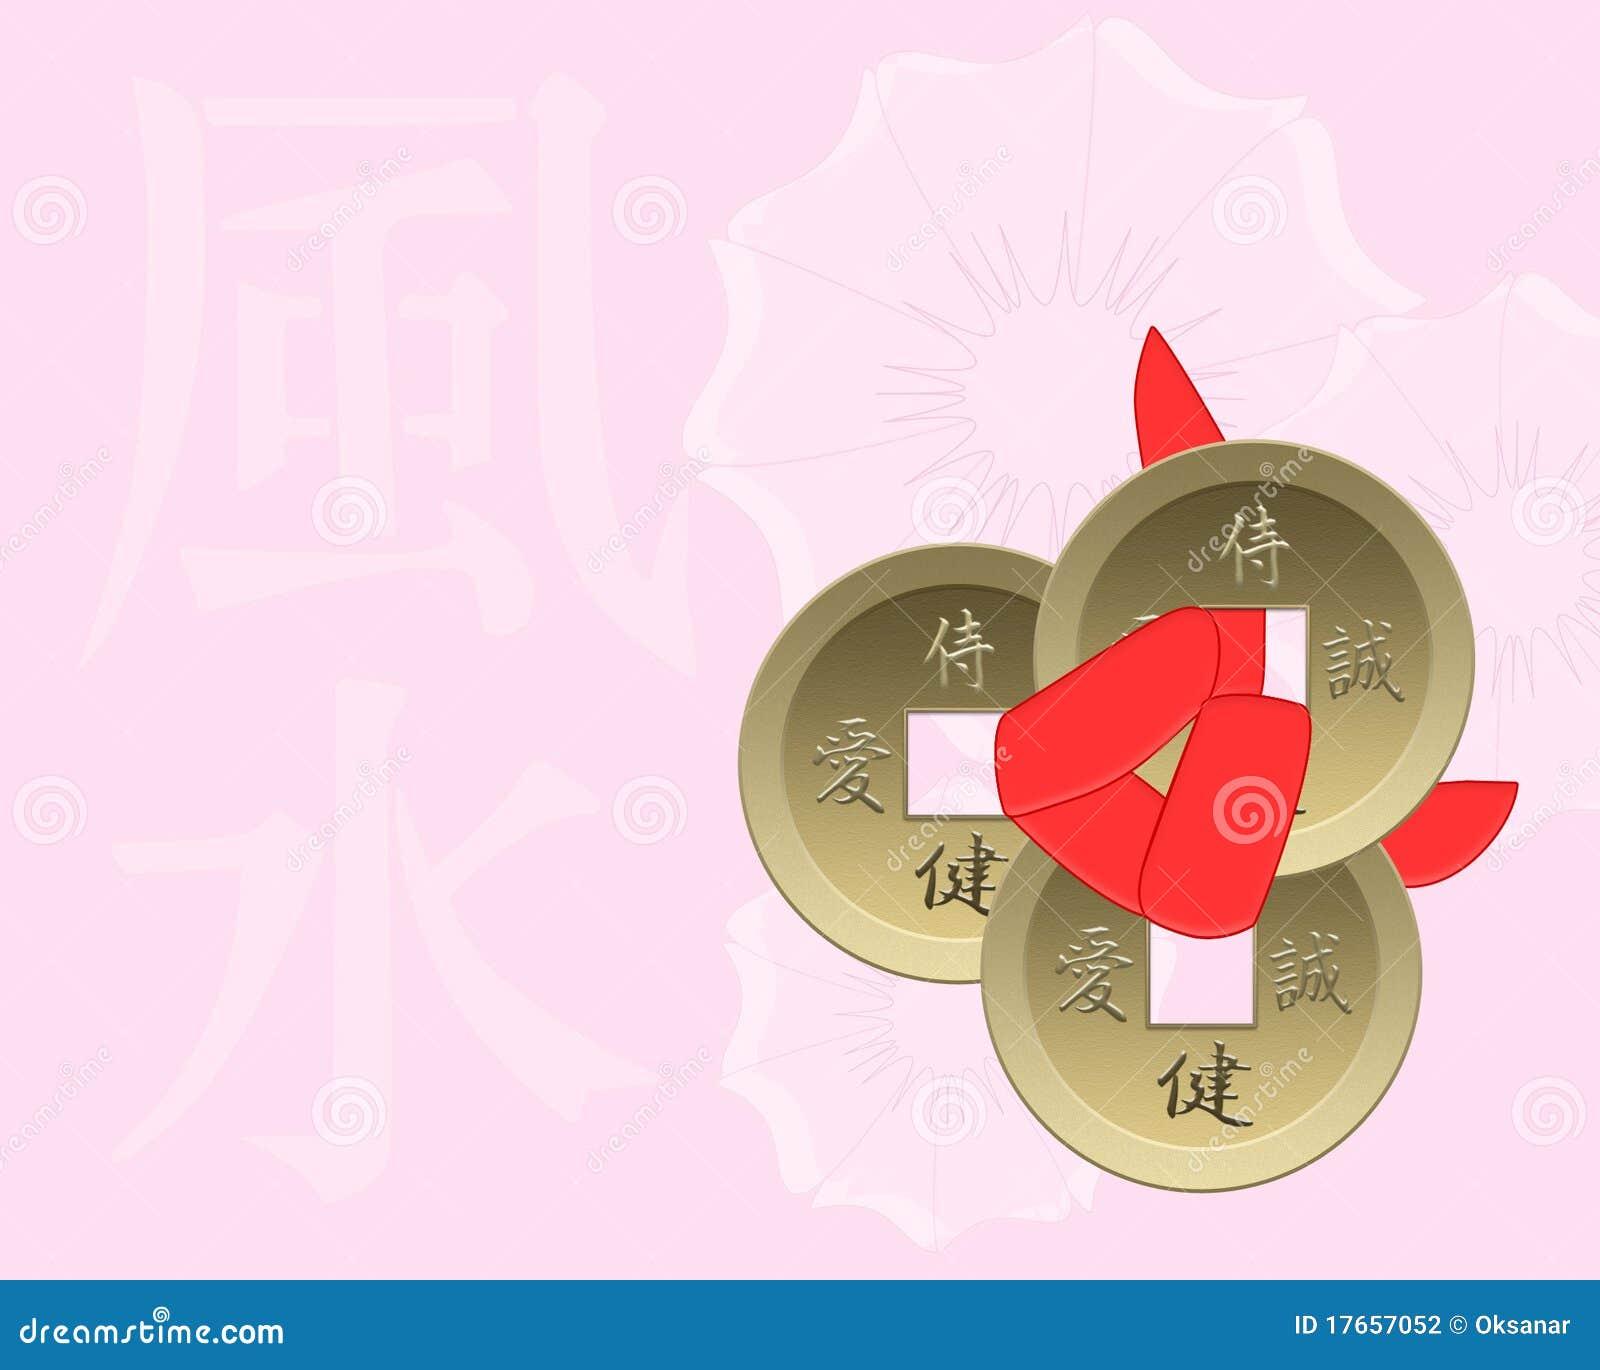 Feng shui lucky coins stock photography image 17657052 - Feng shui good luck coins ...